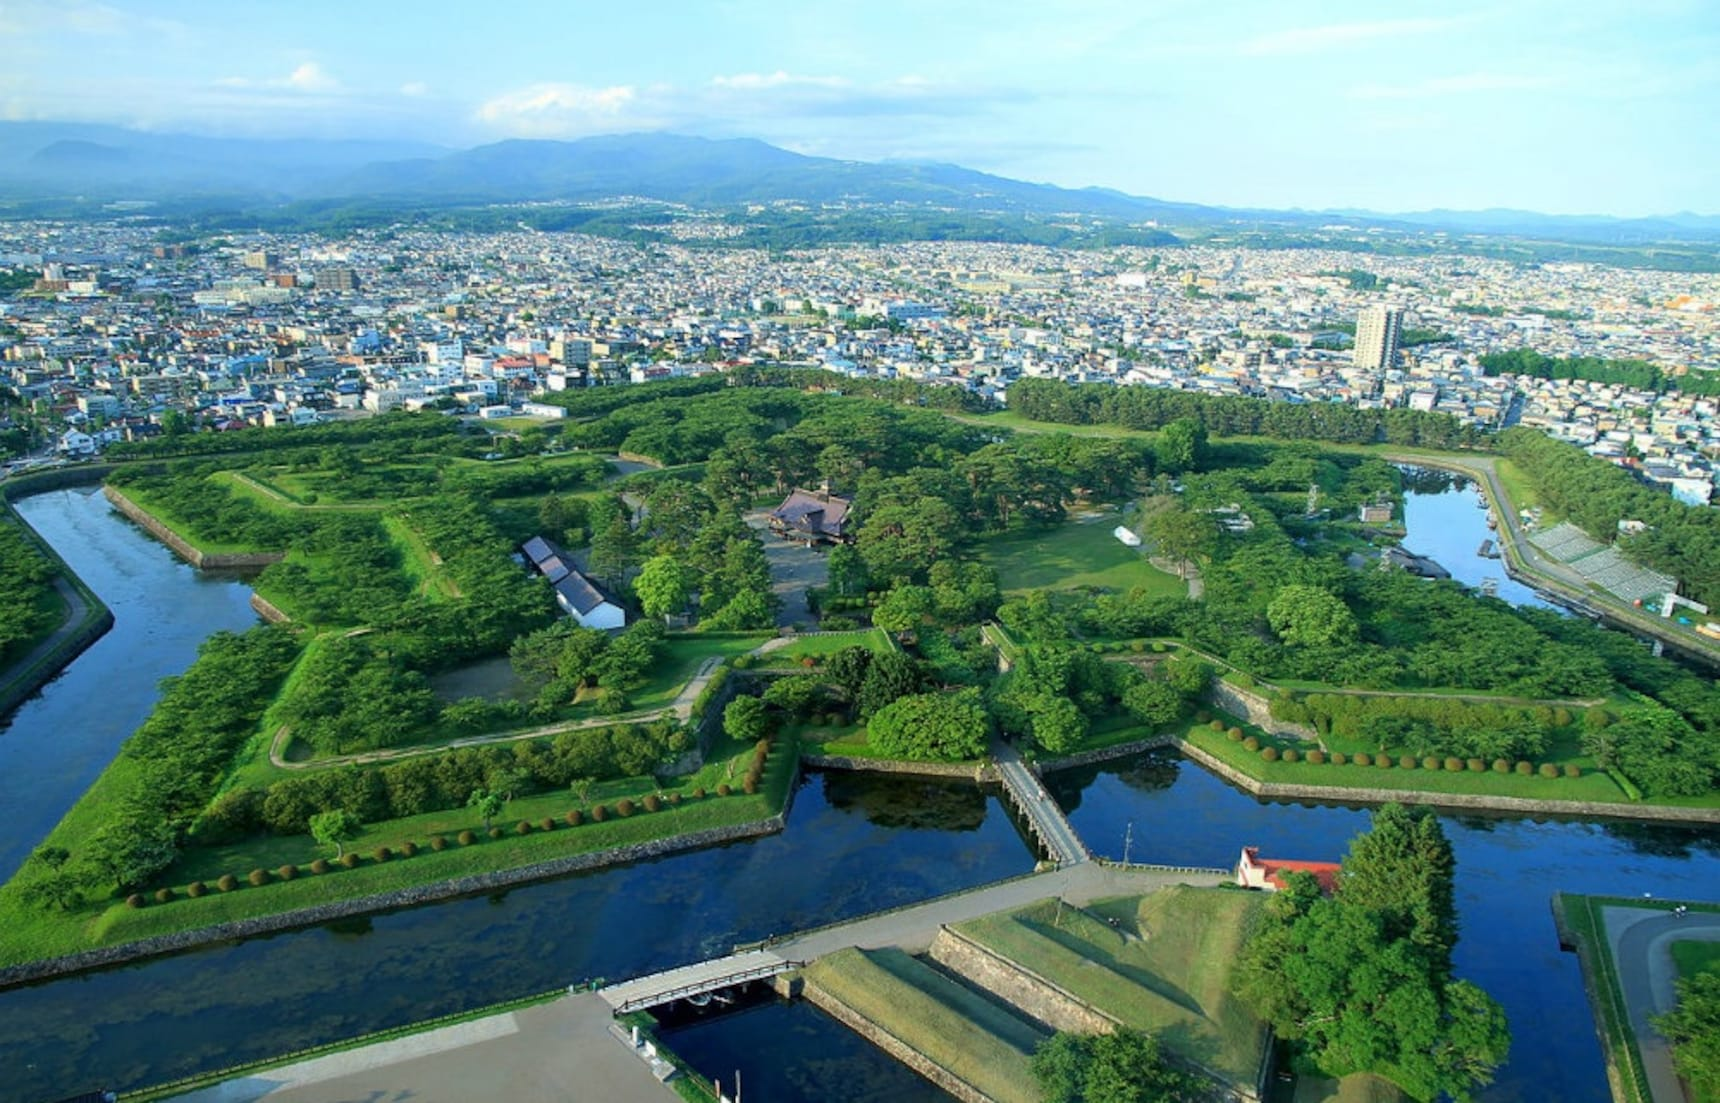 Hakodate: Gateway to the Northern Island